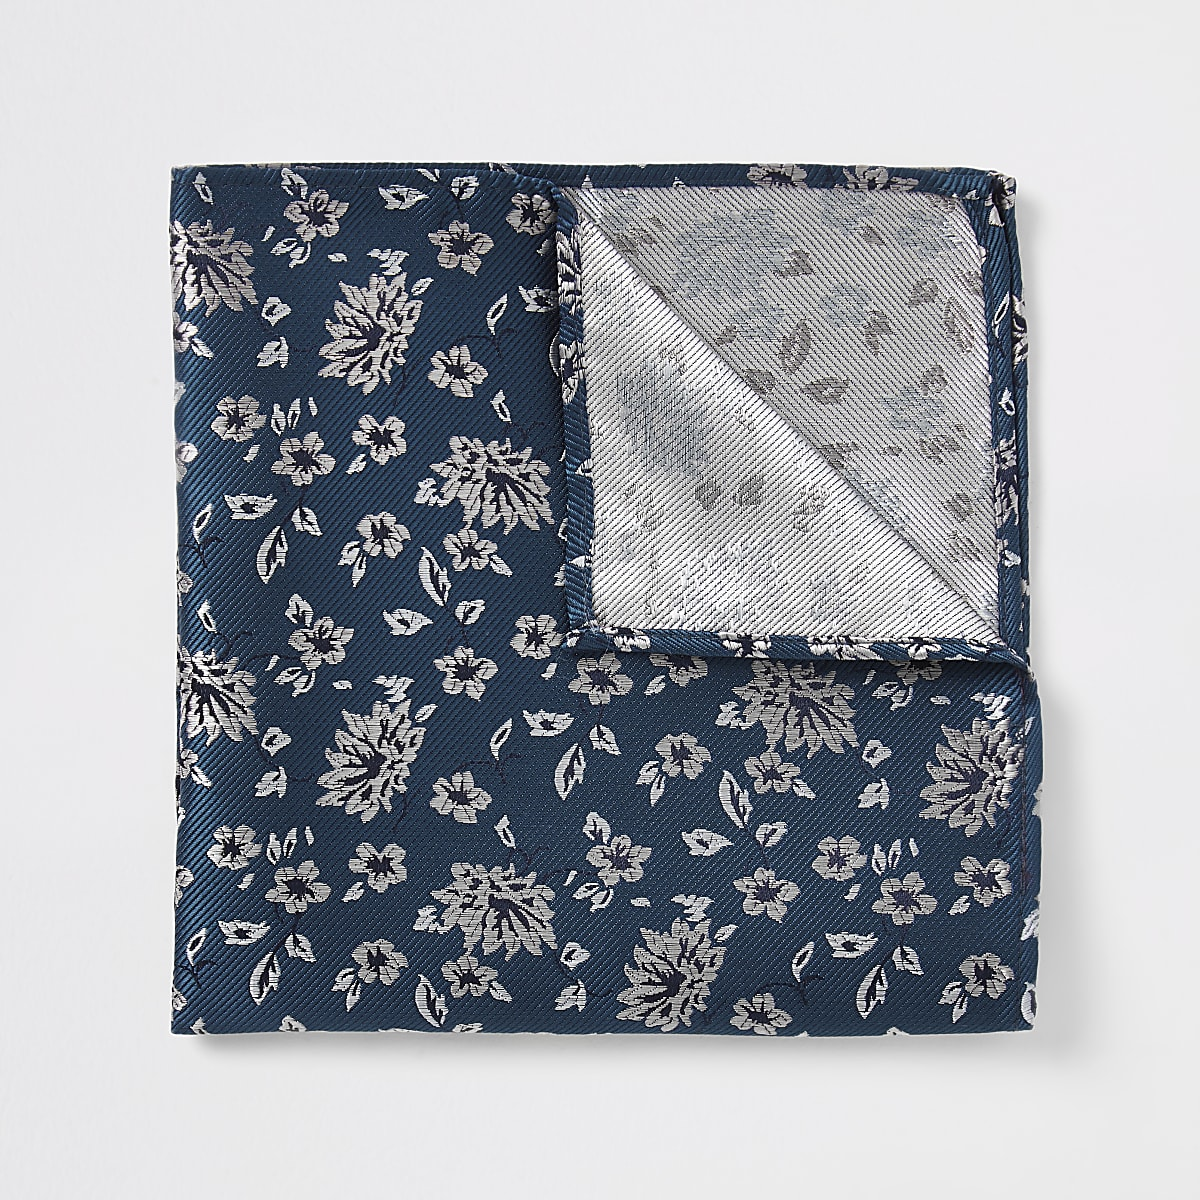 Blauwgroene zakdoek met bloemenprint